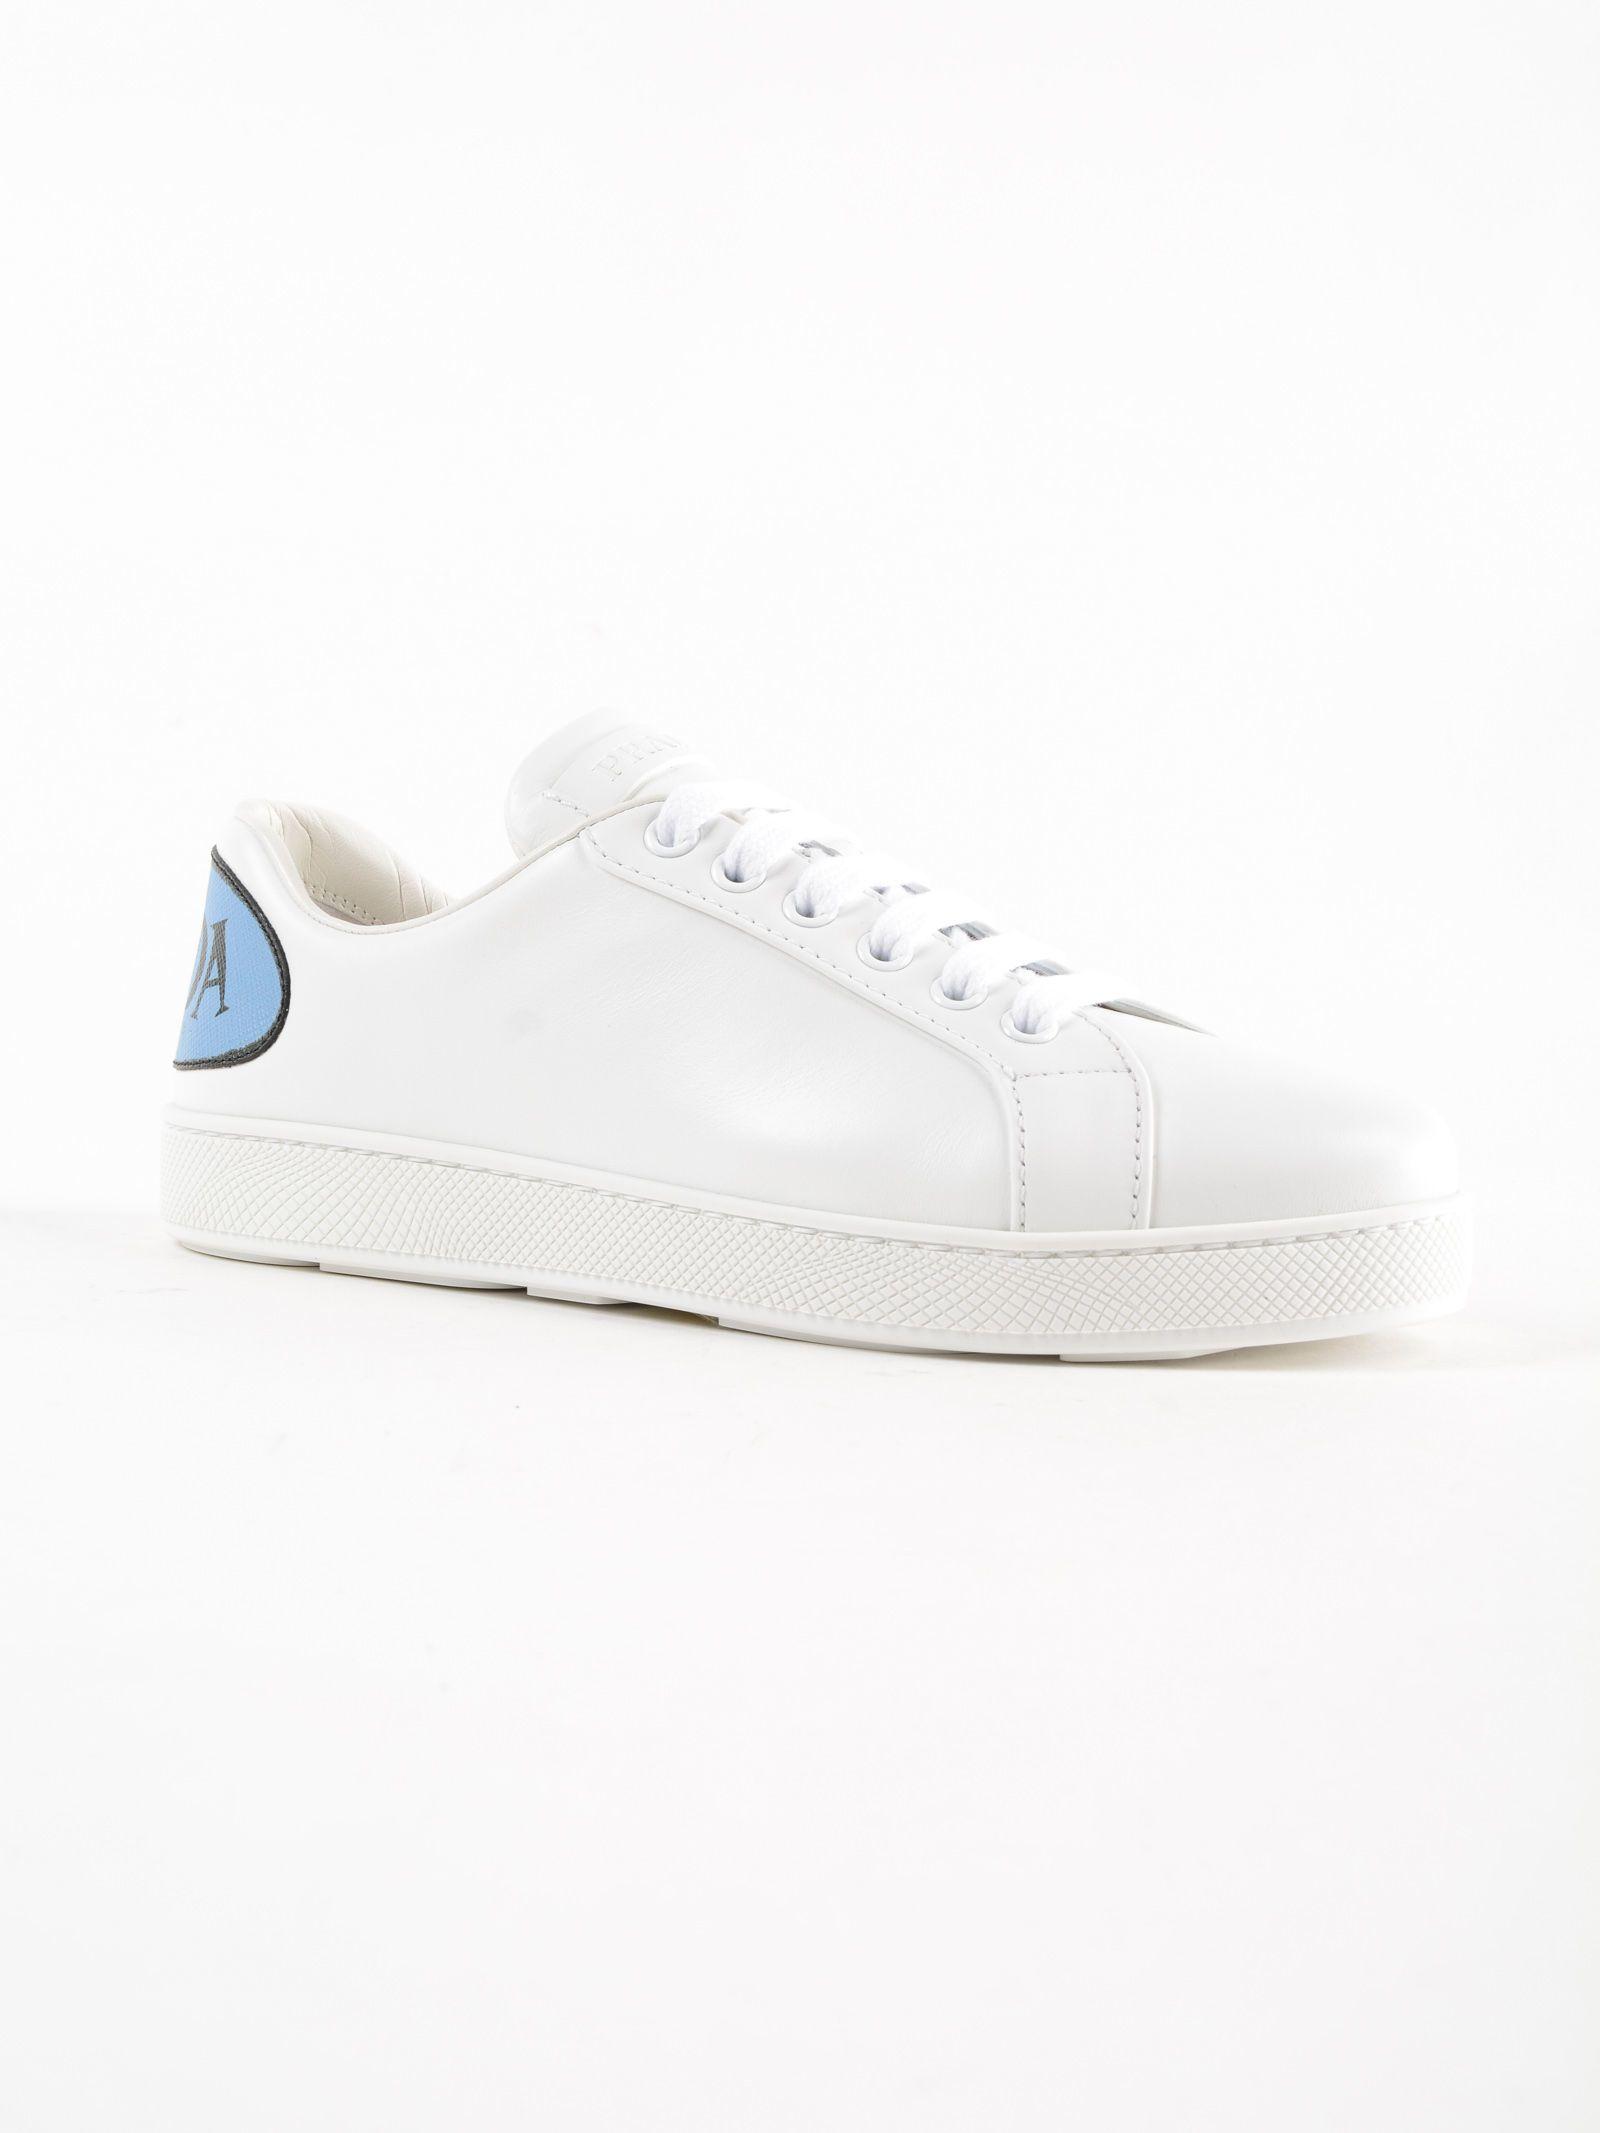 Sneakers - Speech Bubble Sneakers Mare - white - Sneakers for ladies Prada dbstm7d